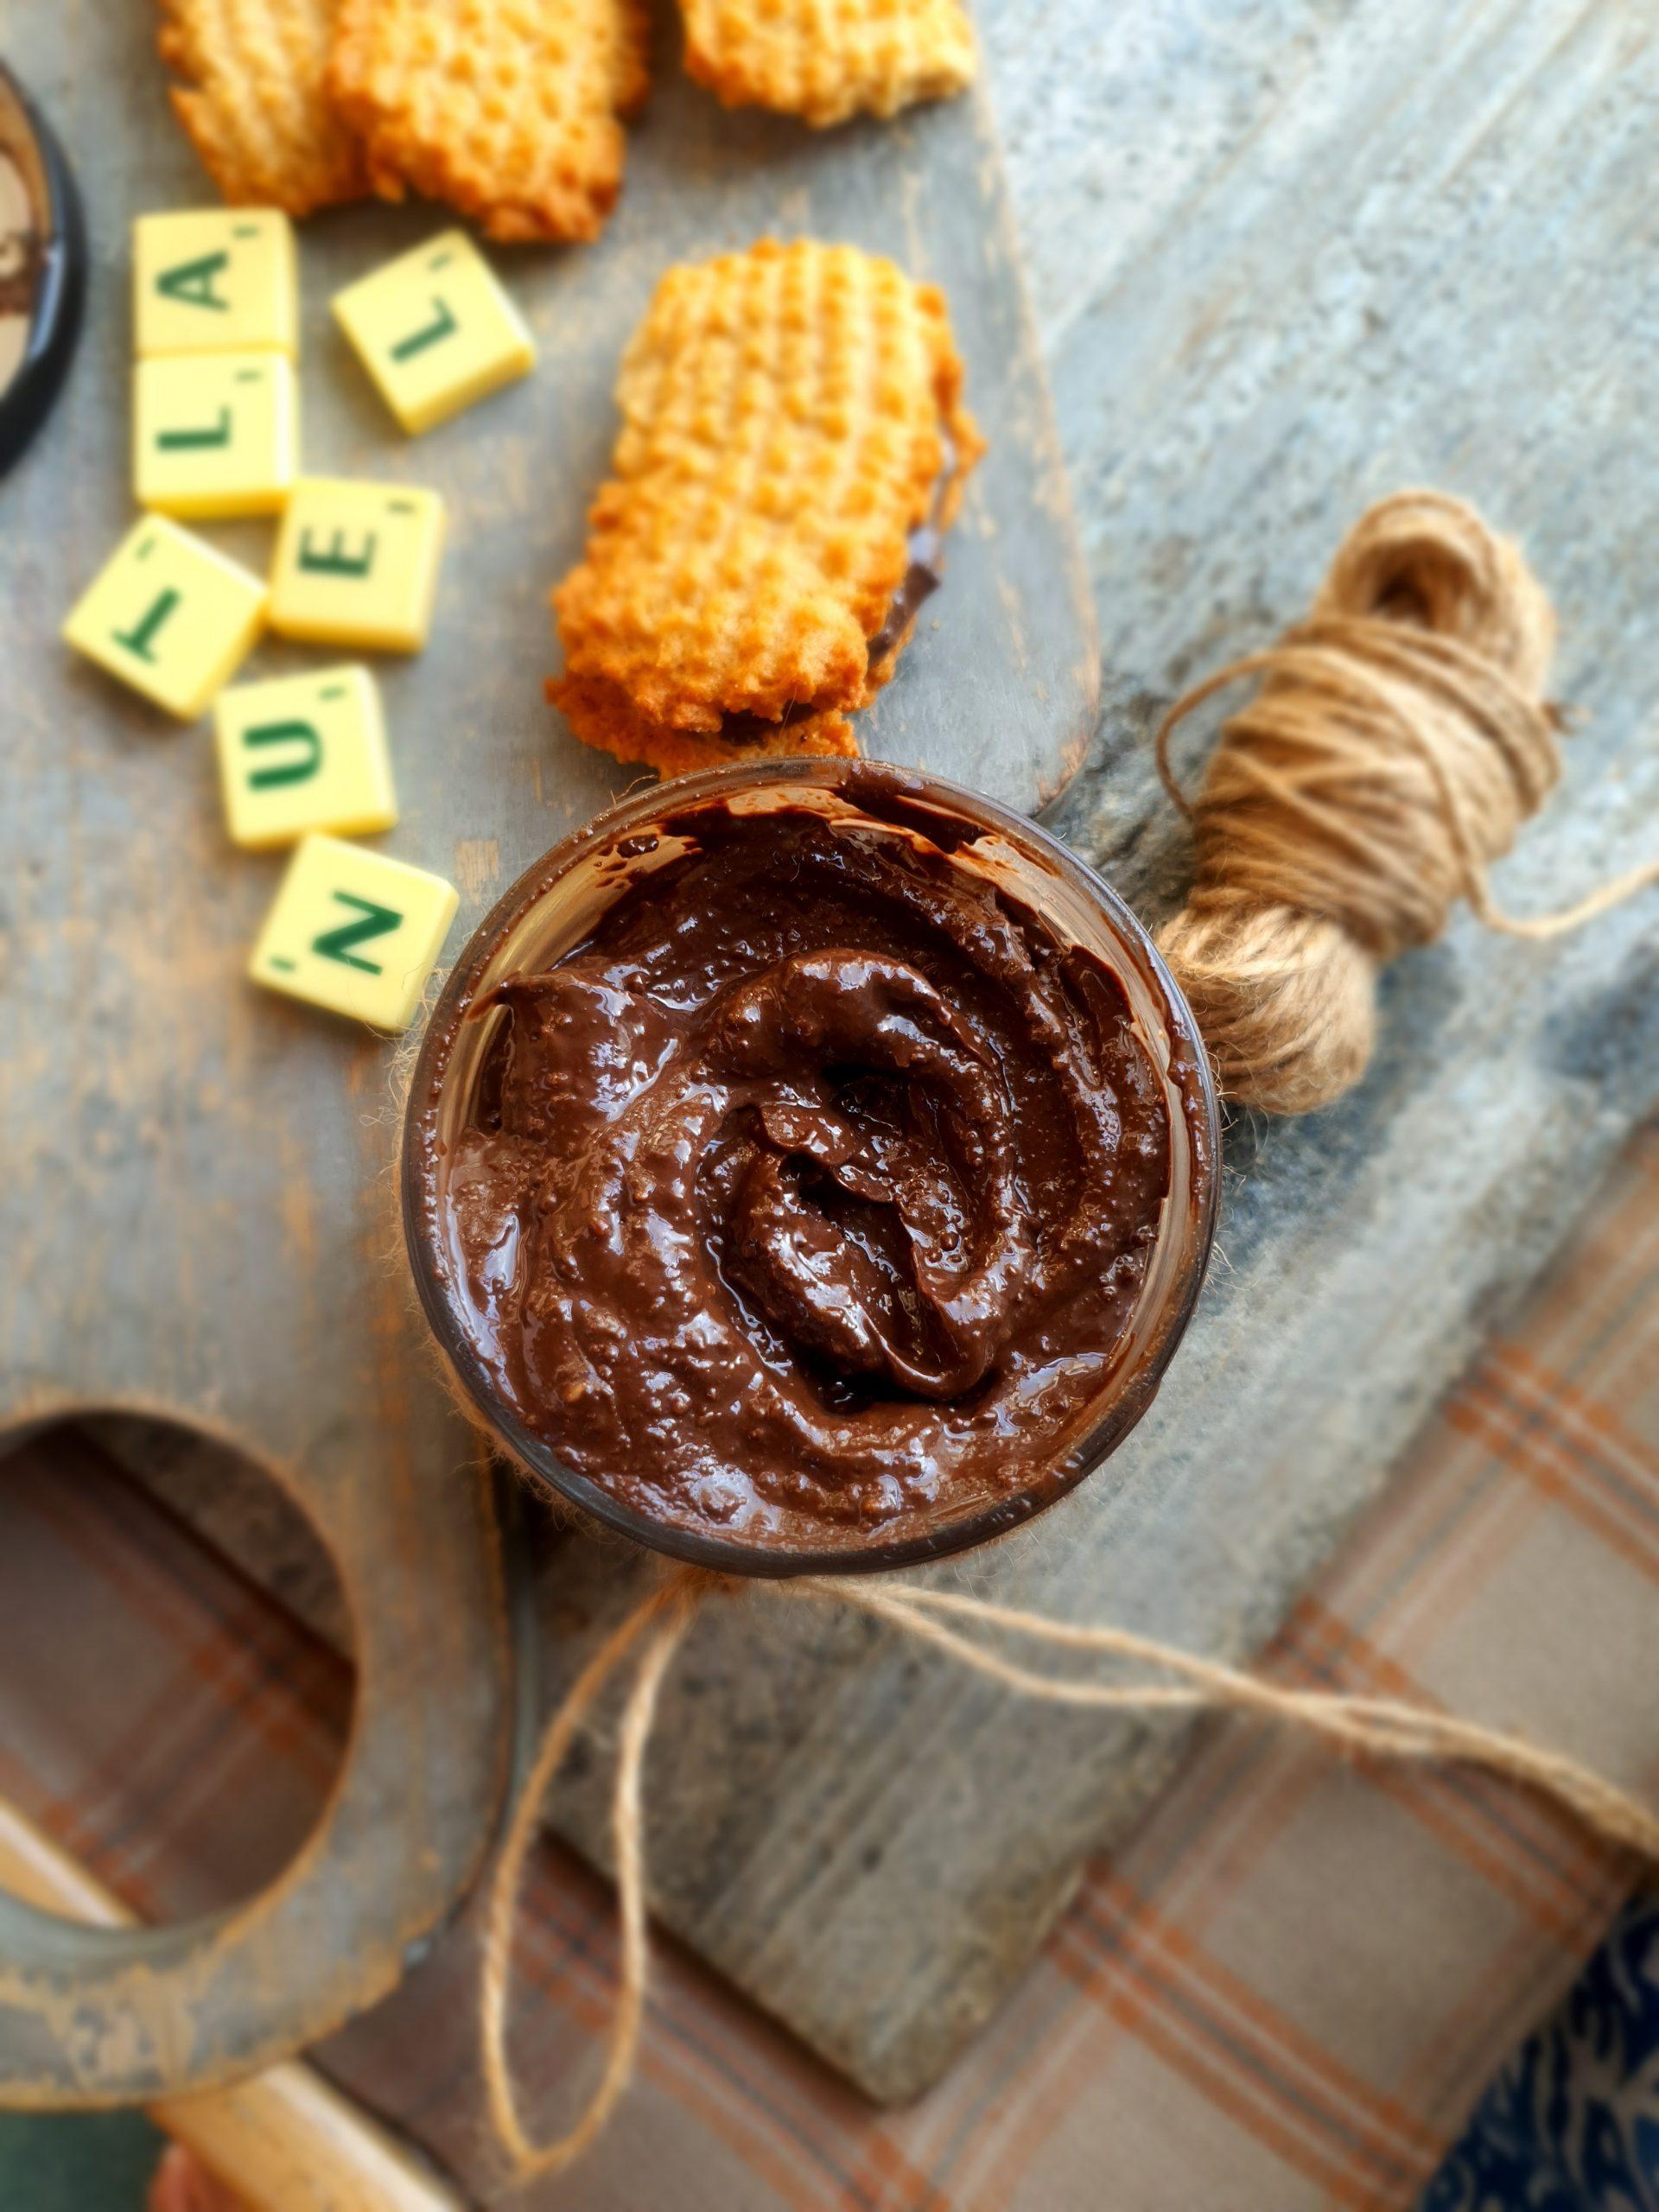 Nutella Chocolate spread….Homemade hazelnut-chocolate spread